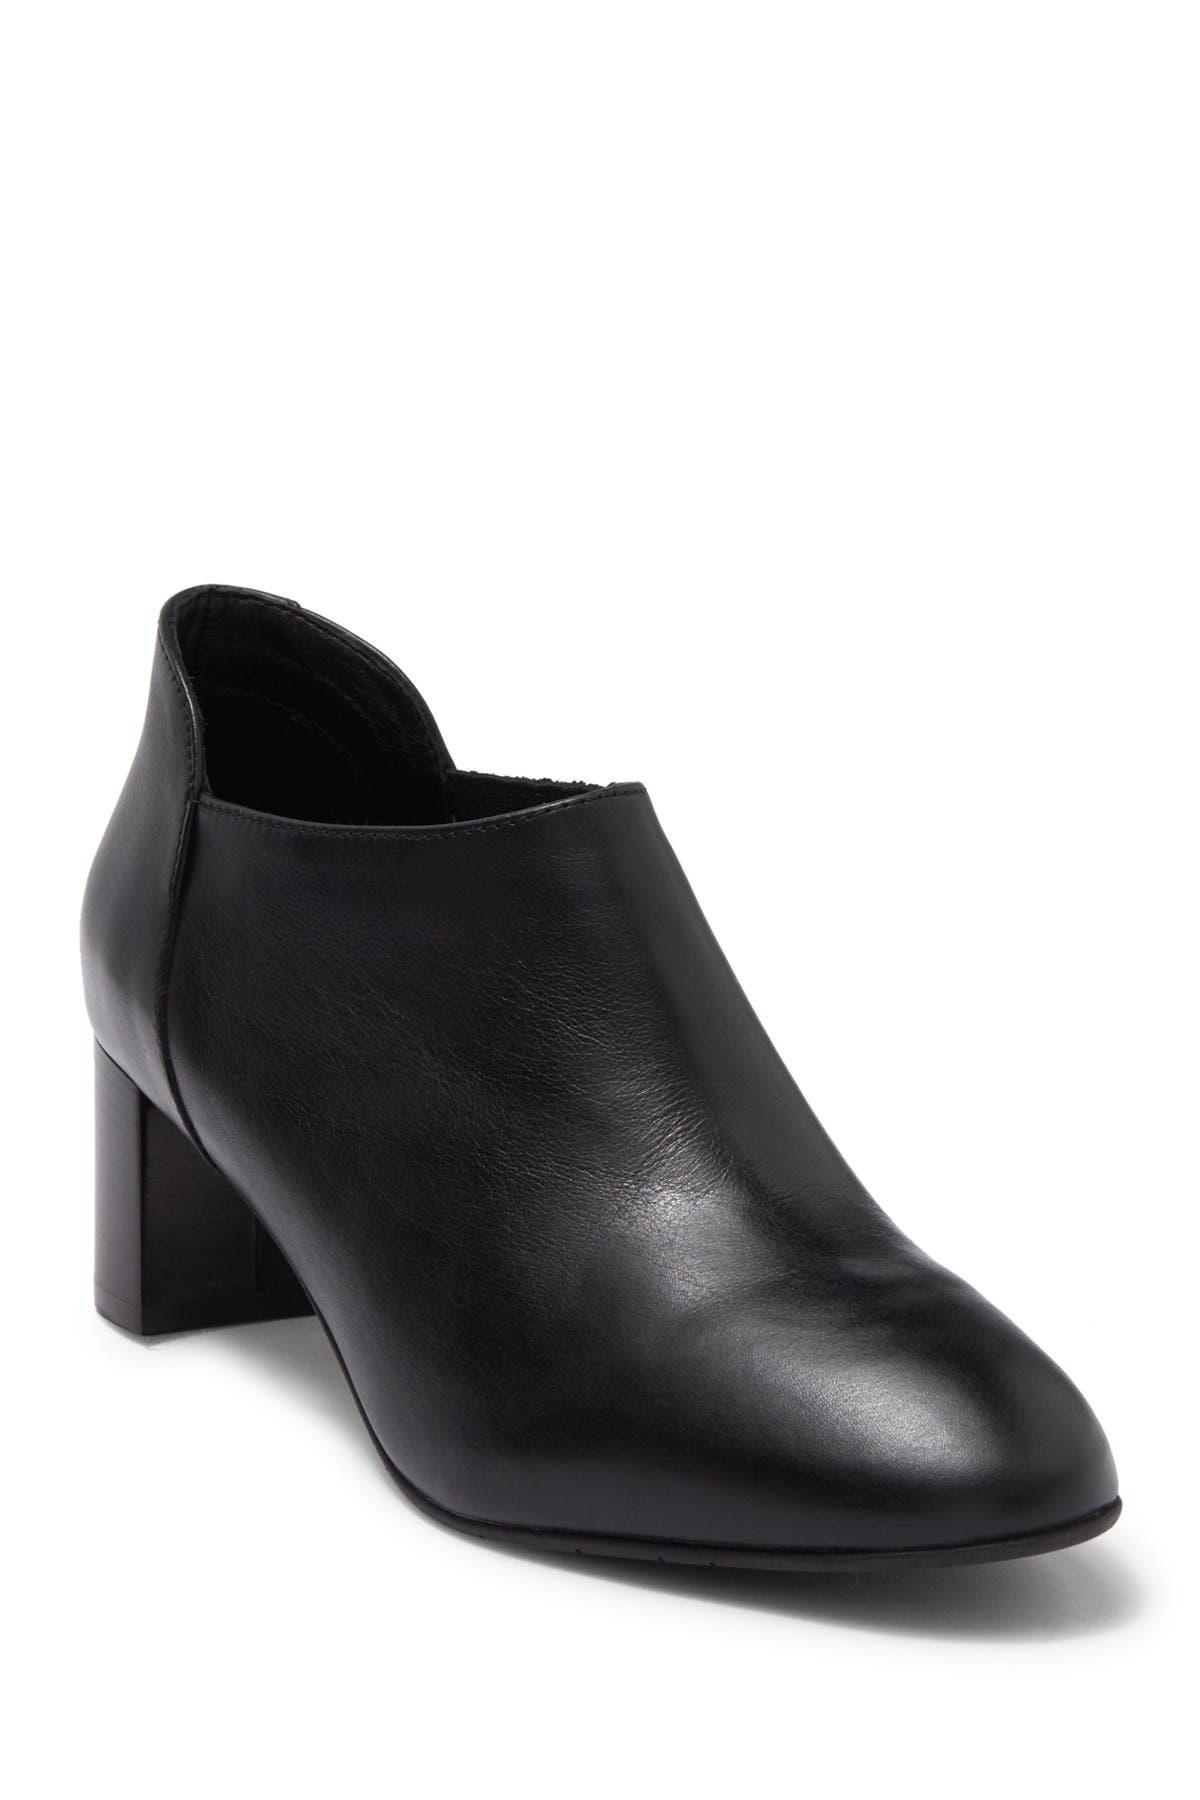 Image of Aquatalia Francisca Leather Ankle Boot